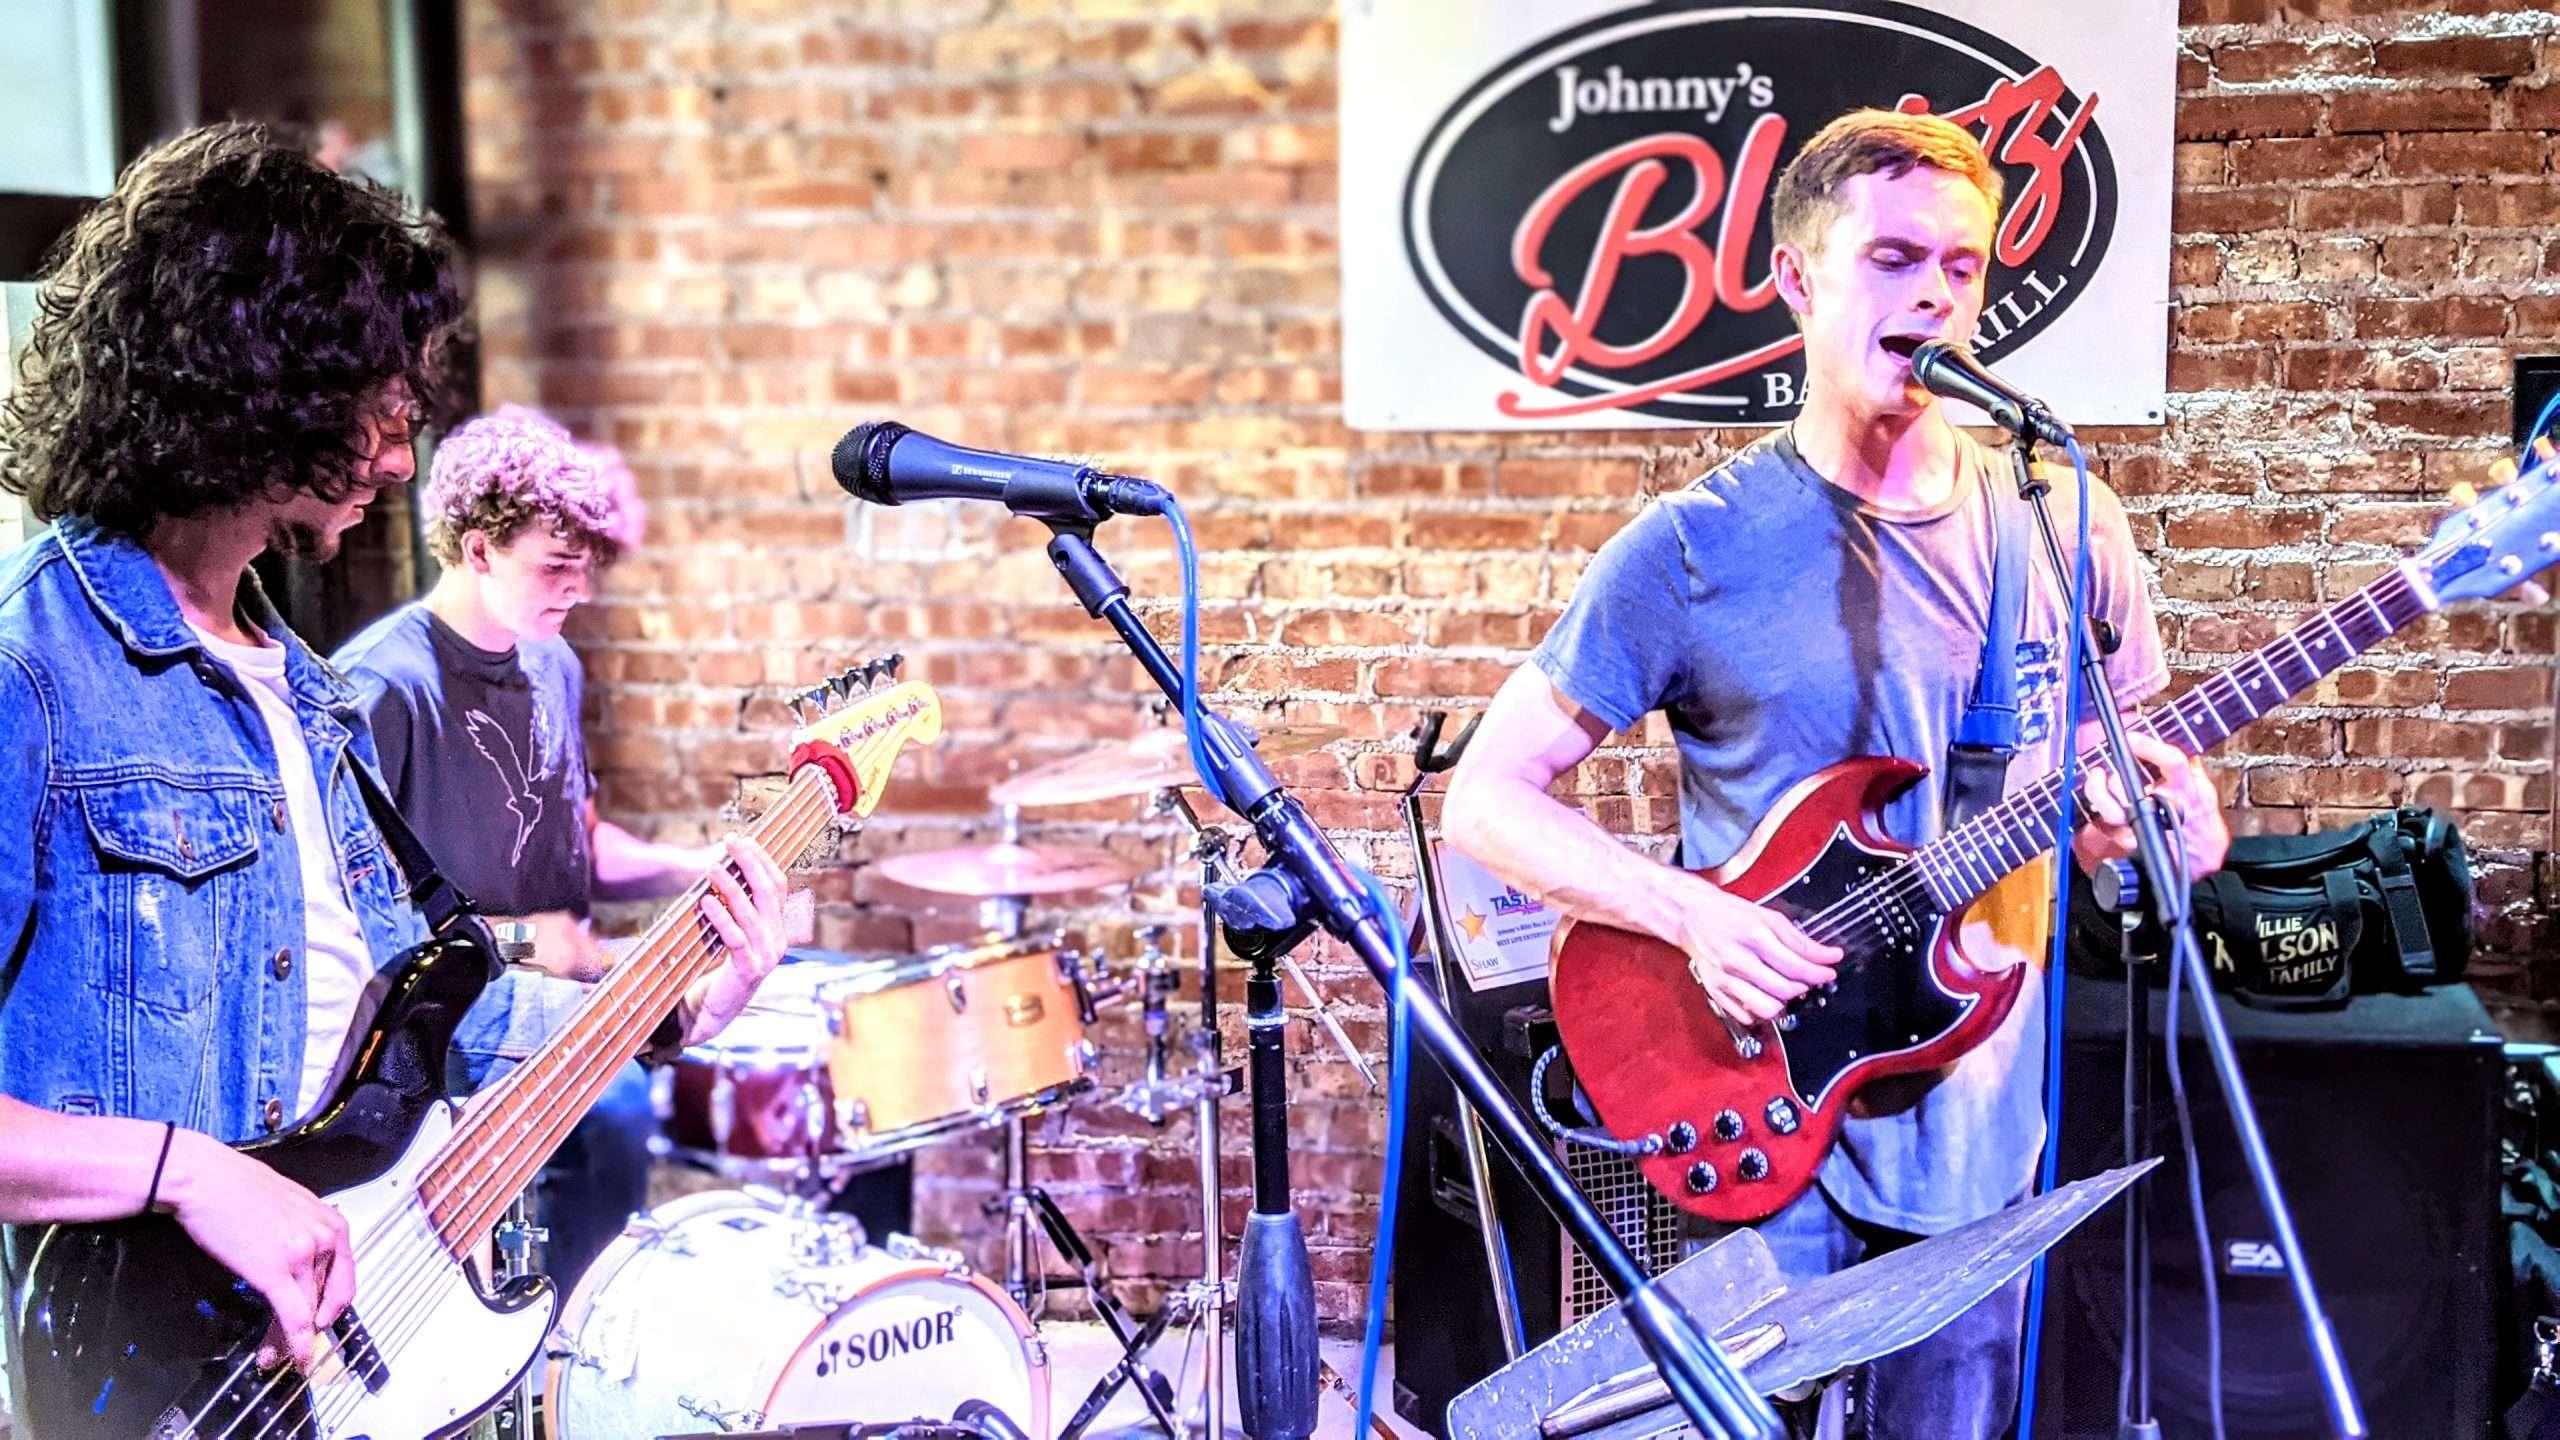 Brian's Open Mic Experiences At Johnny's Blitz Bar & Grill 8